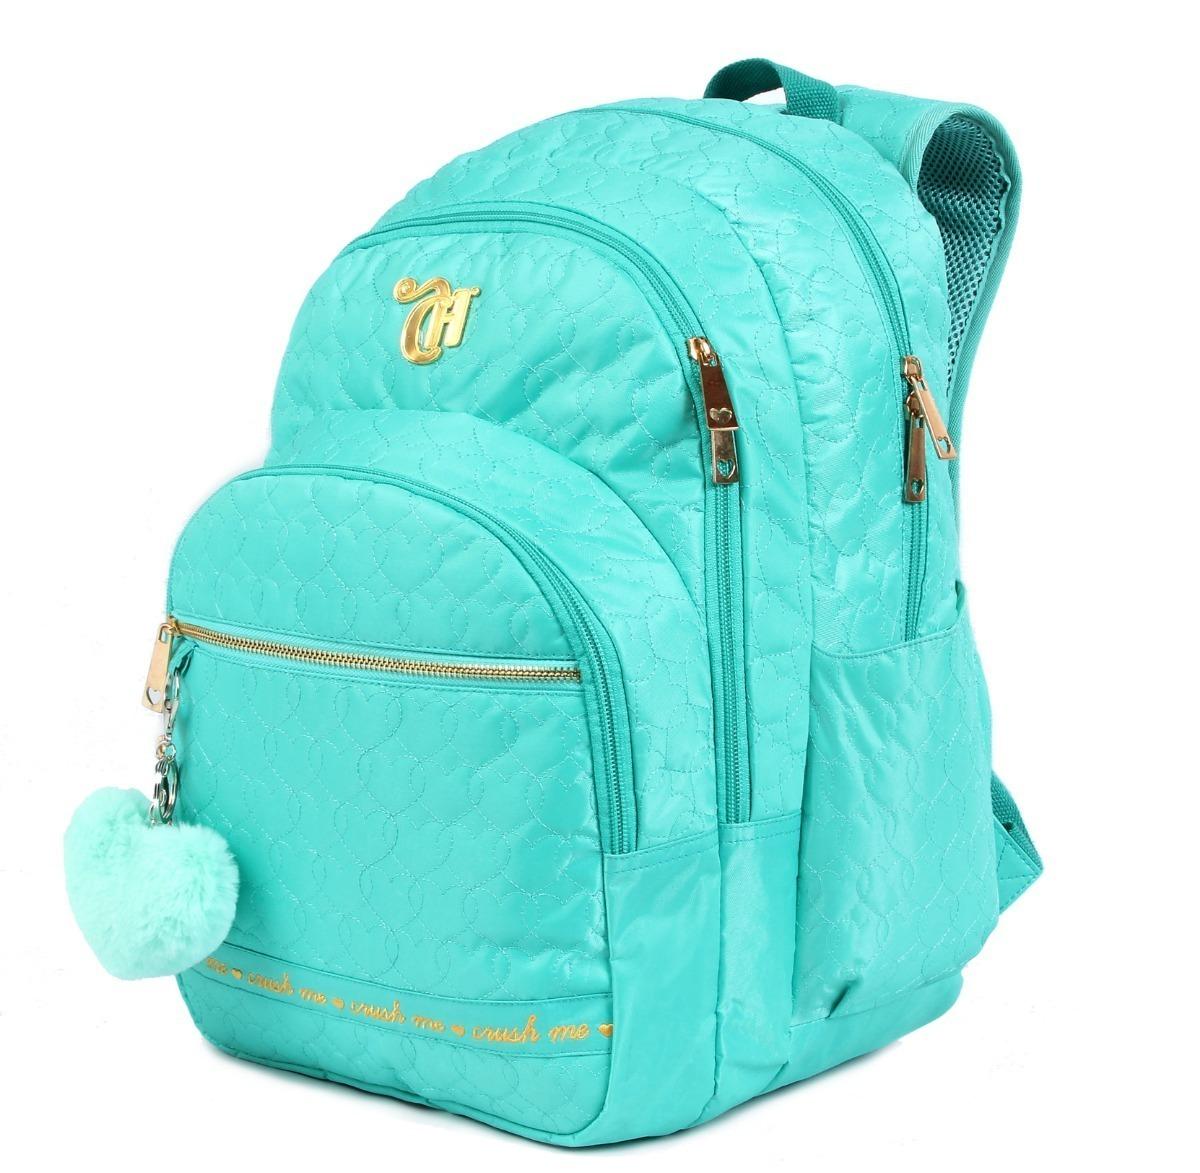 ee553cf09cb5c Mochila Capricho Verde Azul Tiffany 2019 + Estojo Luxo - R  359